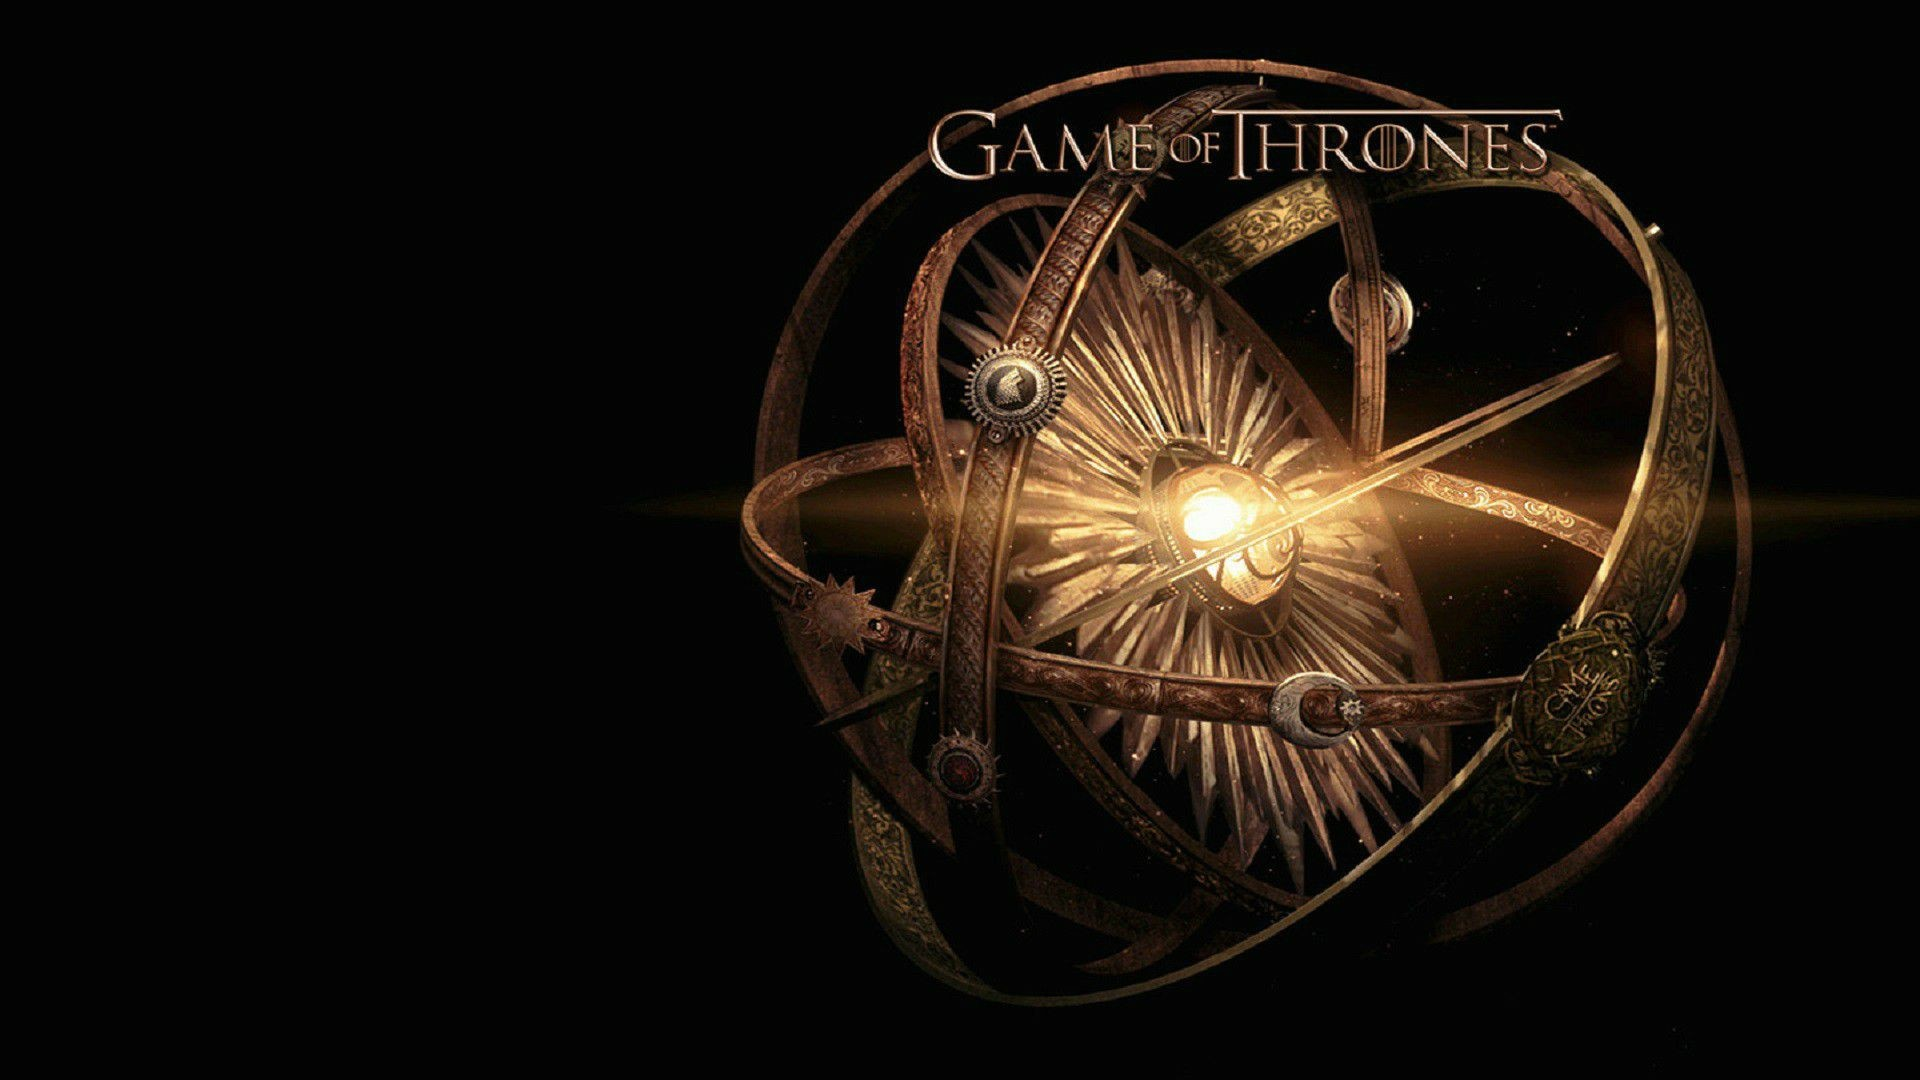 game of thrones season logo wallpaper